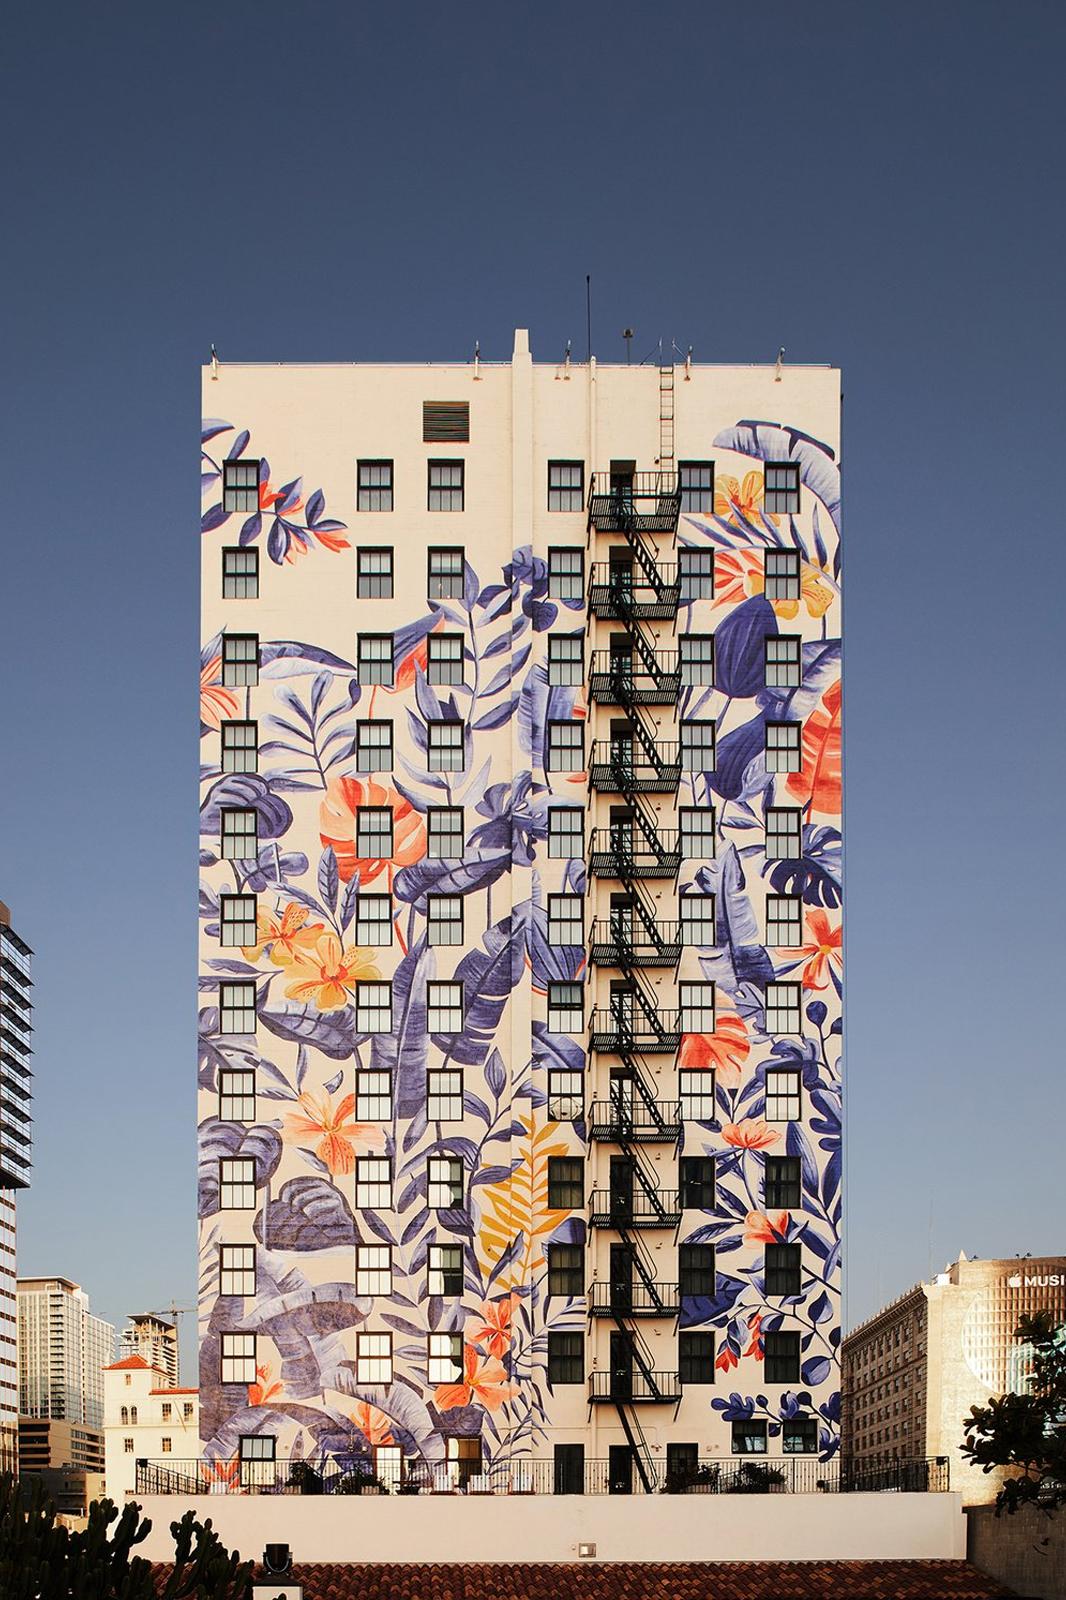 Hotel Figueroa Mural Bella Gomez